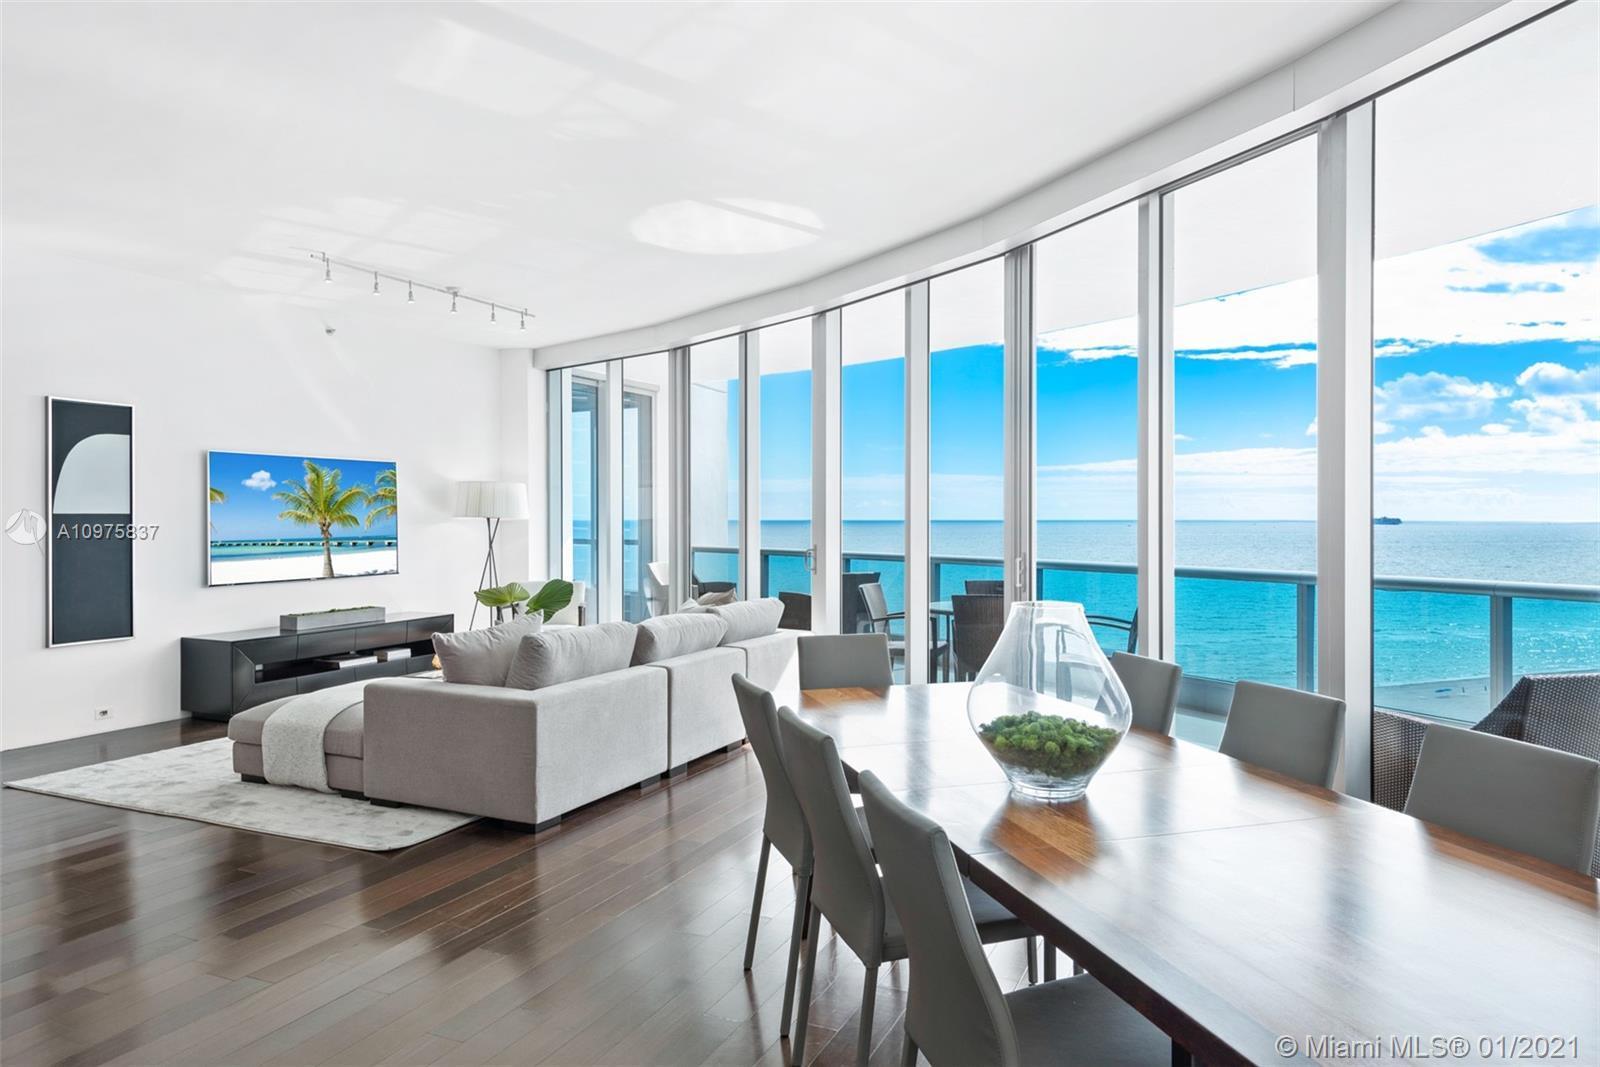 The Bath Club is a prestigious residential building located directly along the Atlantic Ocean on Mia